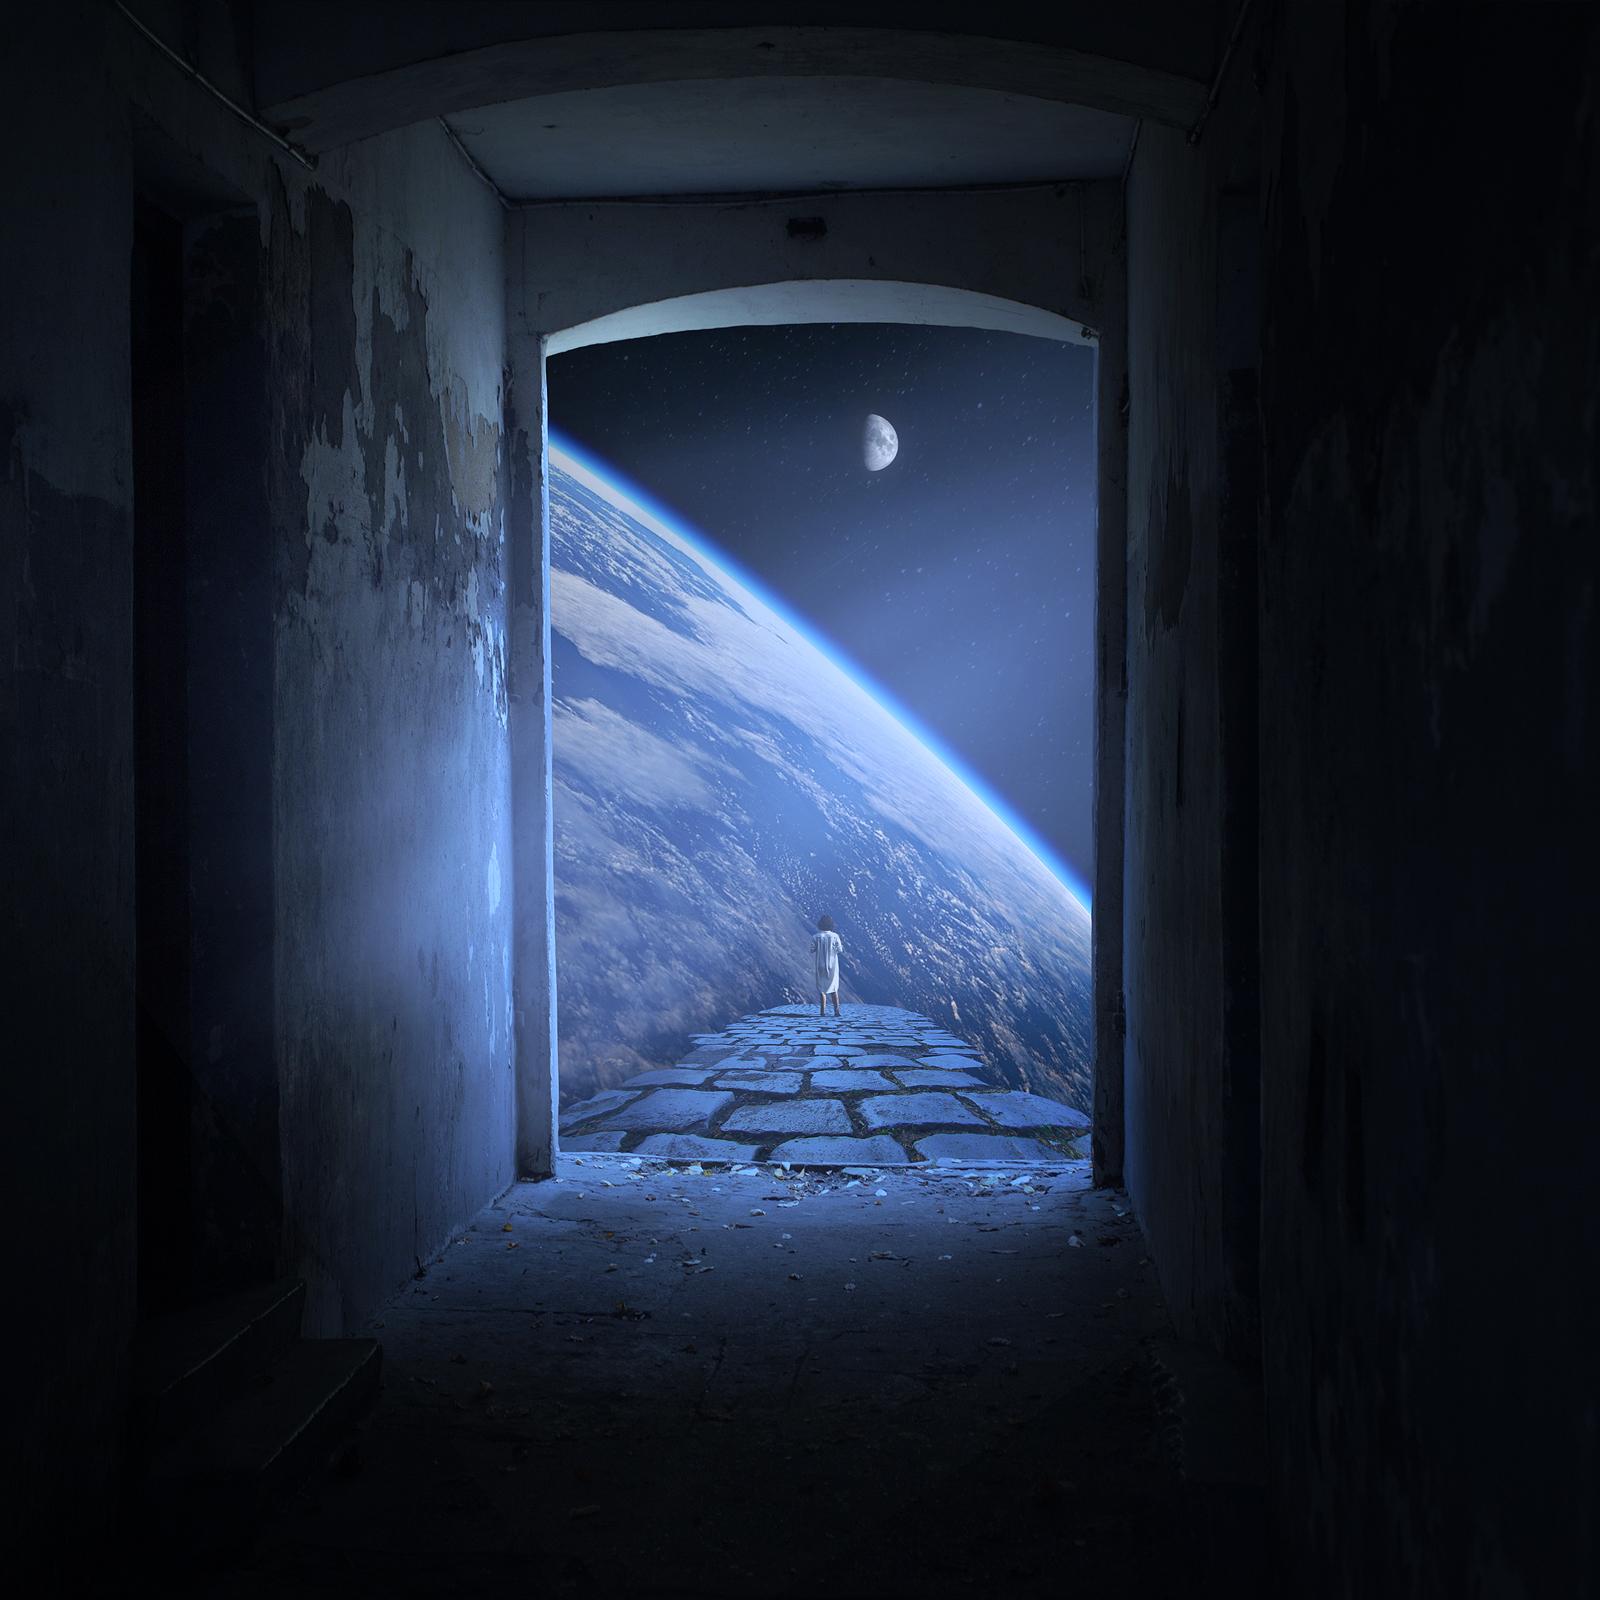 fantastyka kosmos